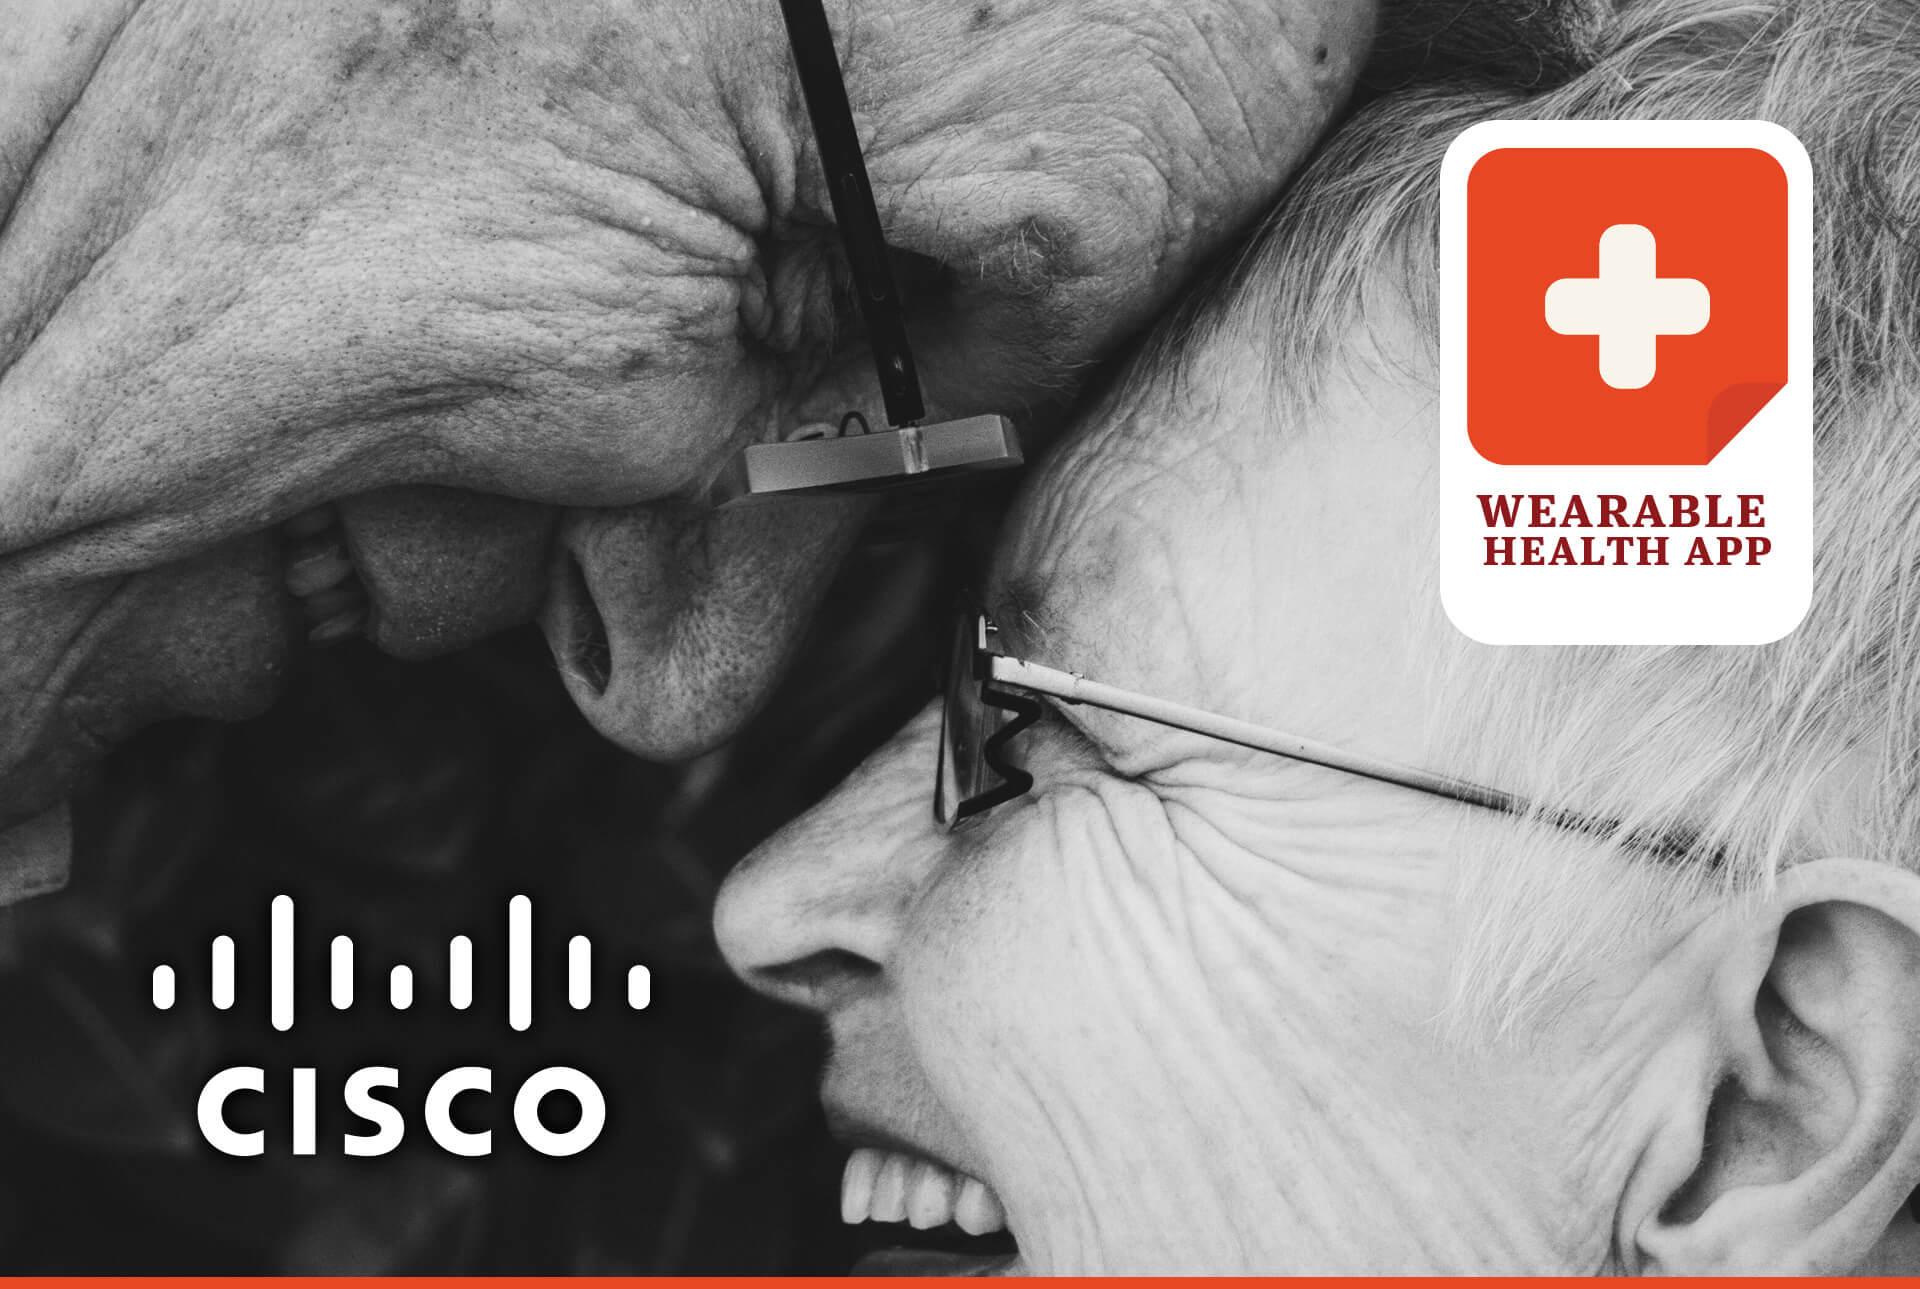 U-Health Cisco: Case Study - Portfolio by Federico Slivka